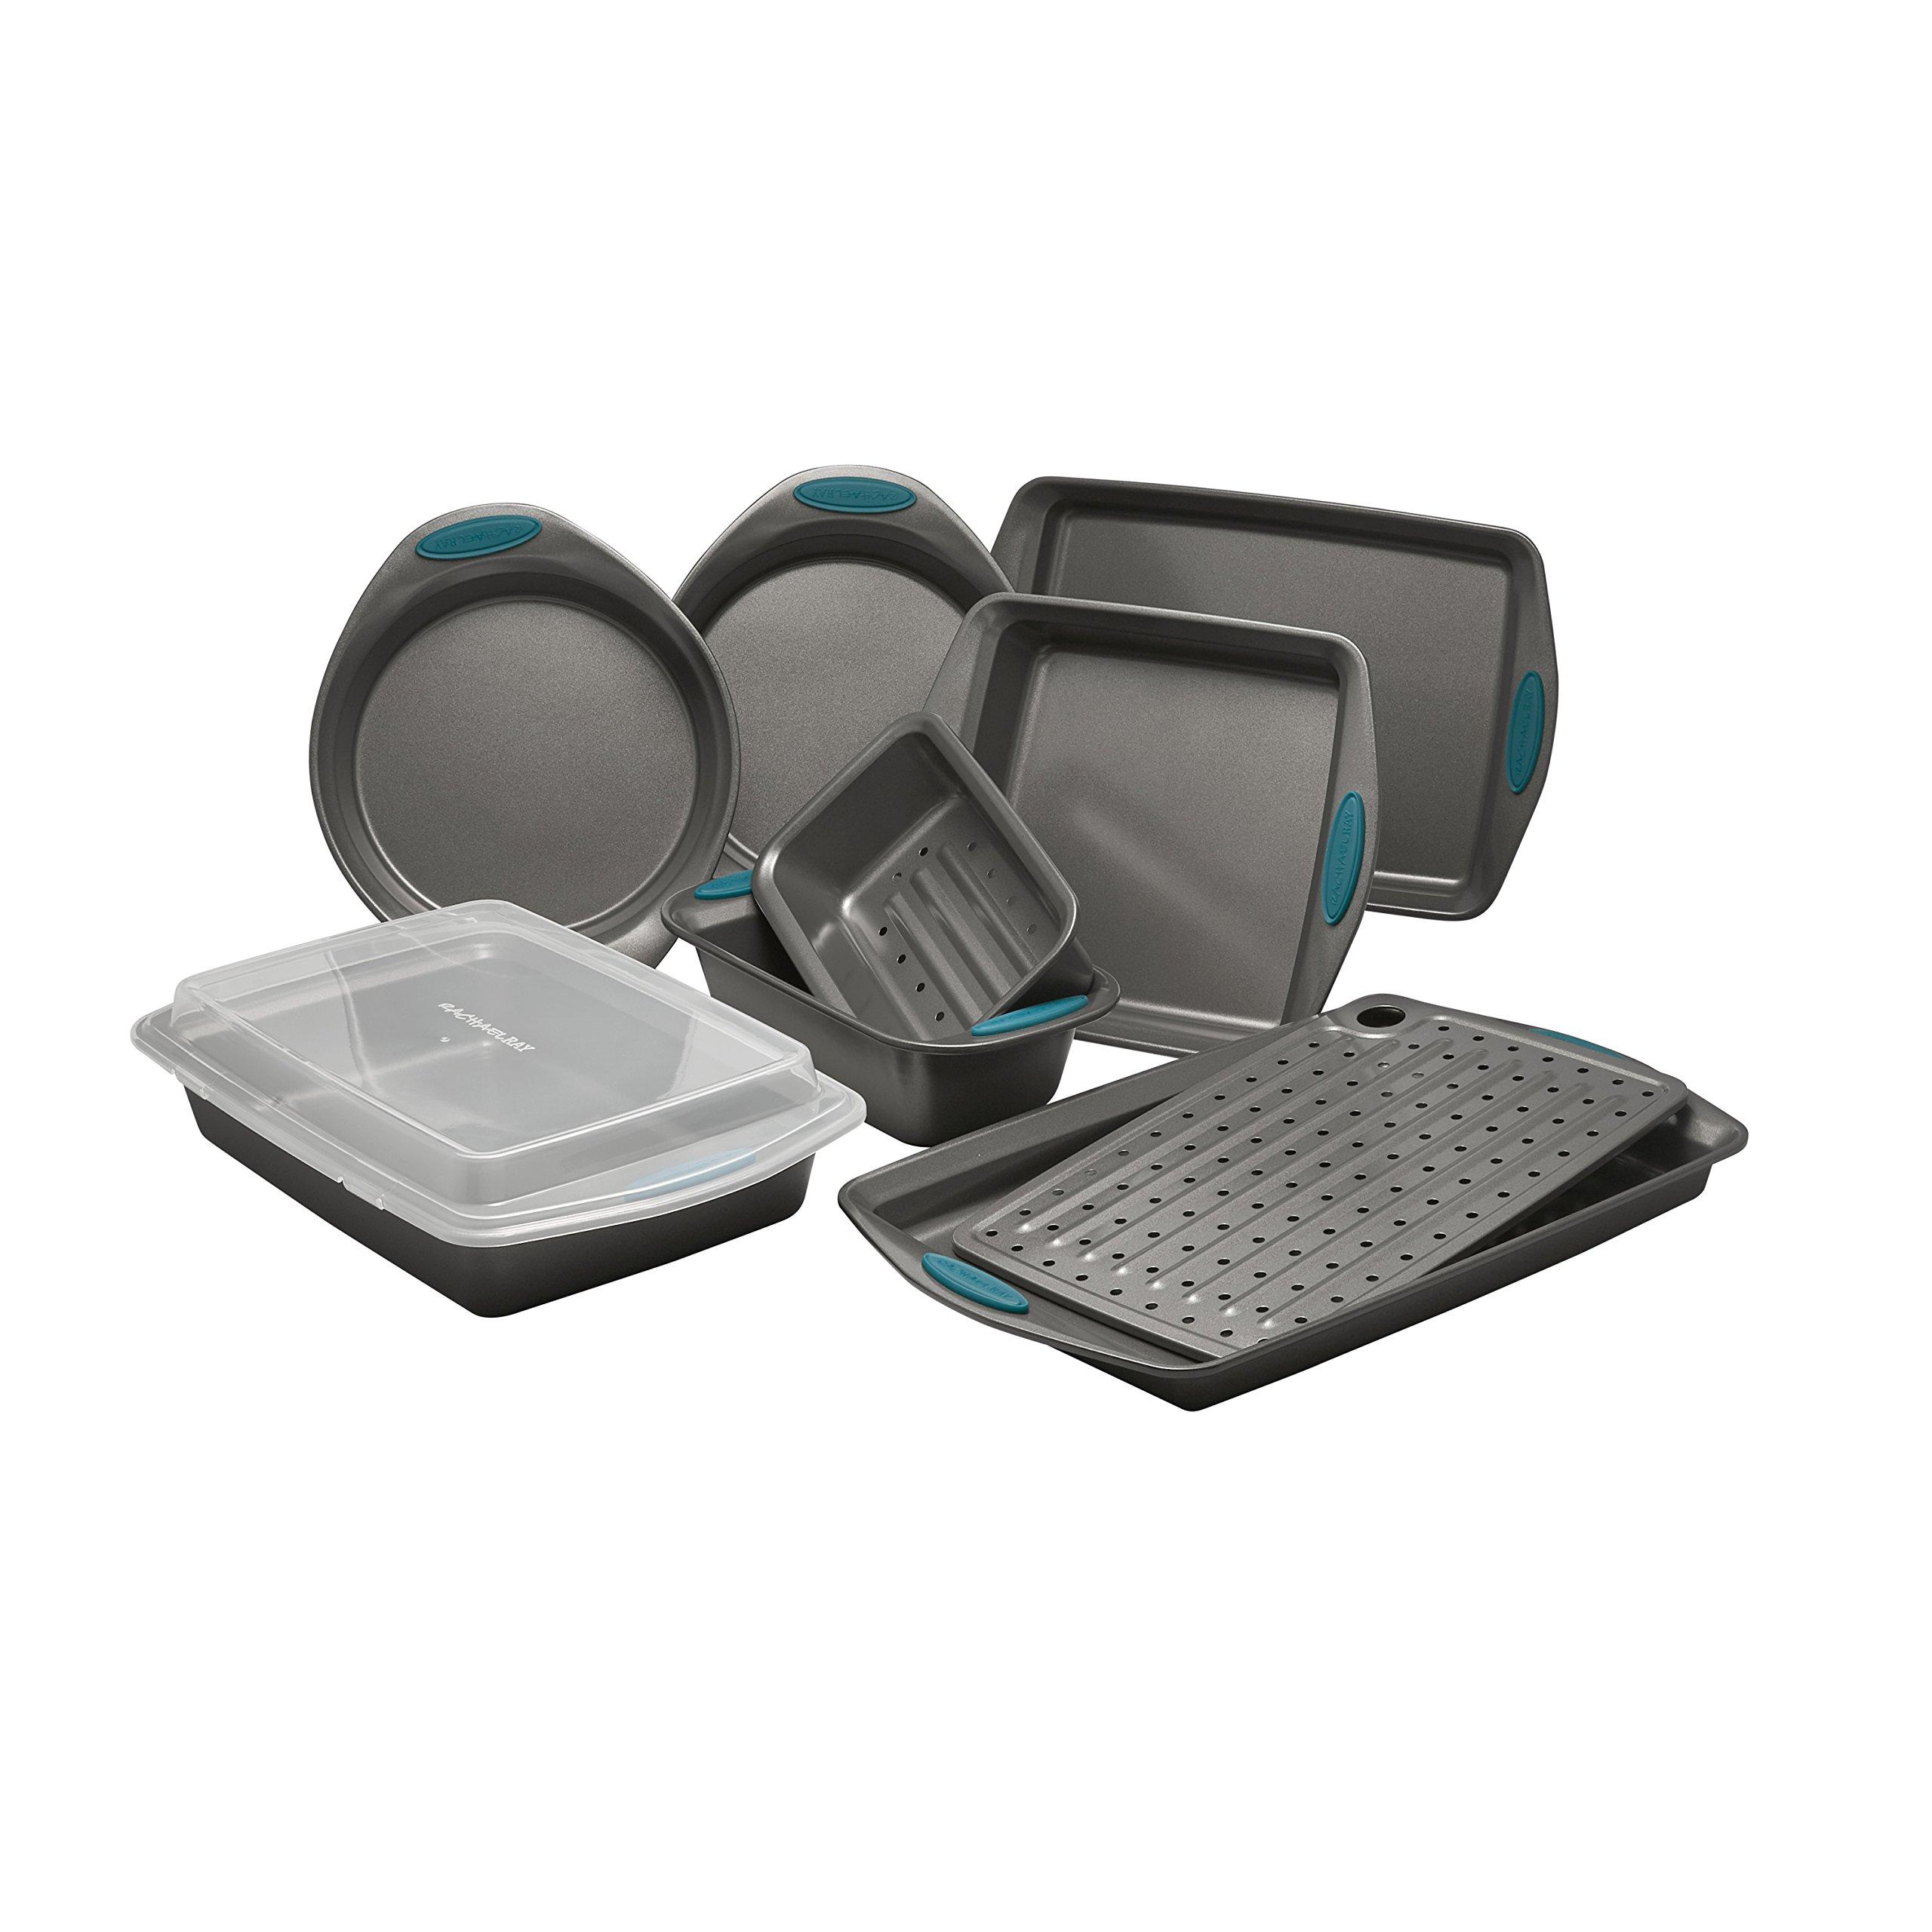 Rachael Ray Yum-o! Nonstick Bakeware 10-Piece Oven Lovin' Bakeware Set, Gray with Marine Blue Handles